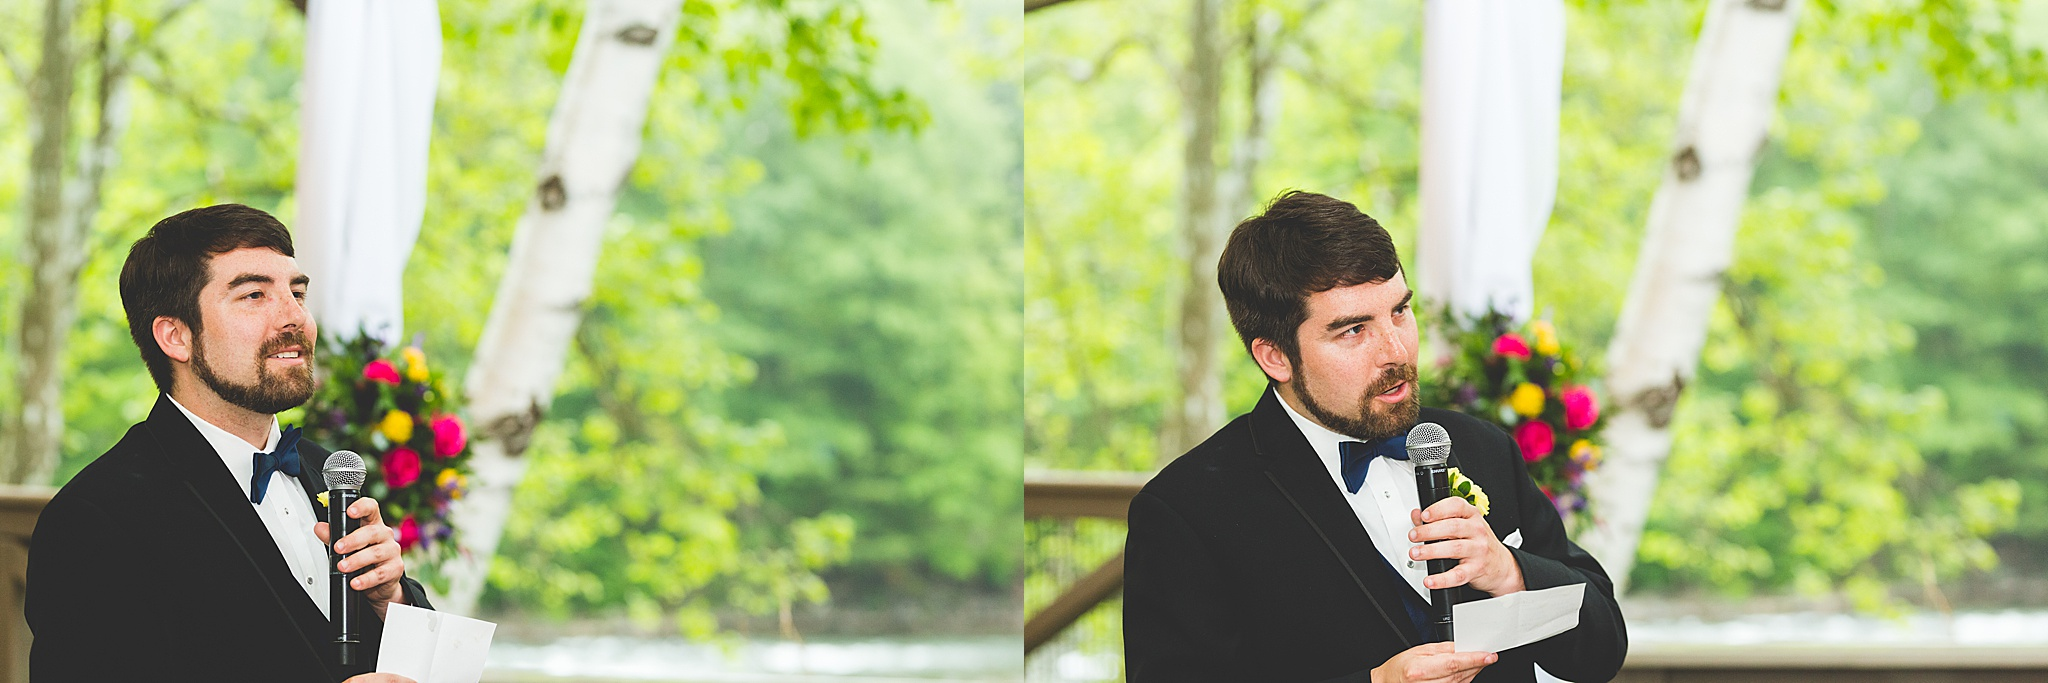 Albany_Wedding_Photographer_7378.jpg